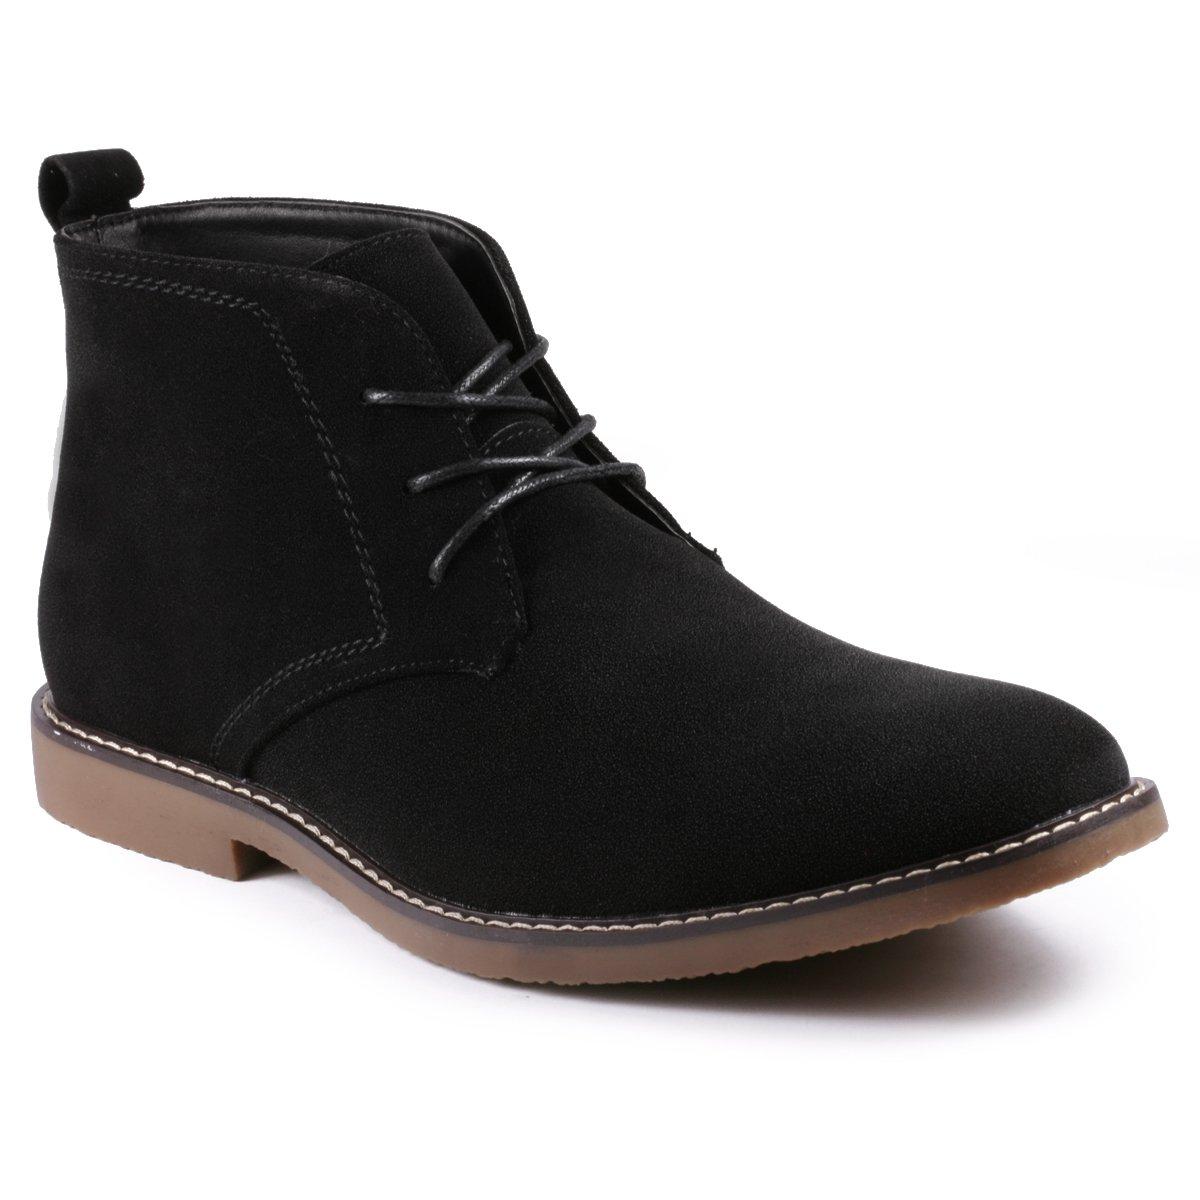 Metrocharm MC127 Men's Lace up Casual Fashion Ankle Chukka Boots (9 D(M) US, Black)